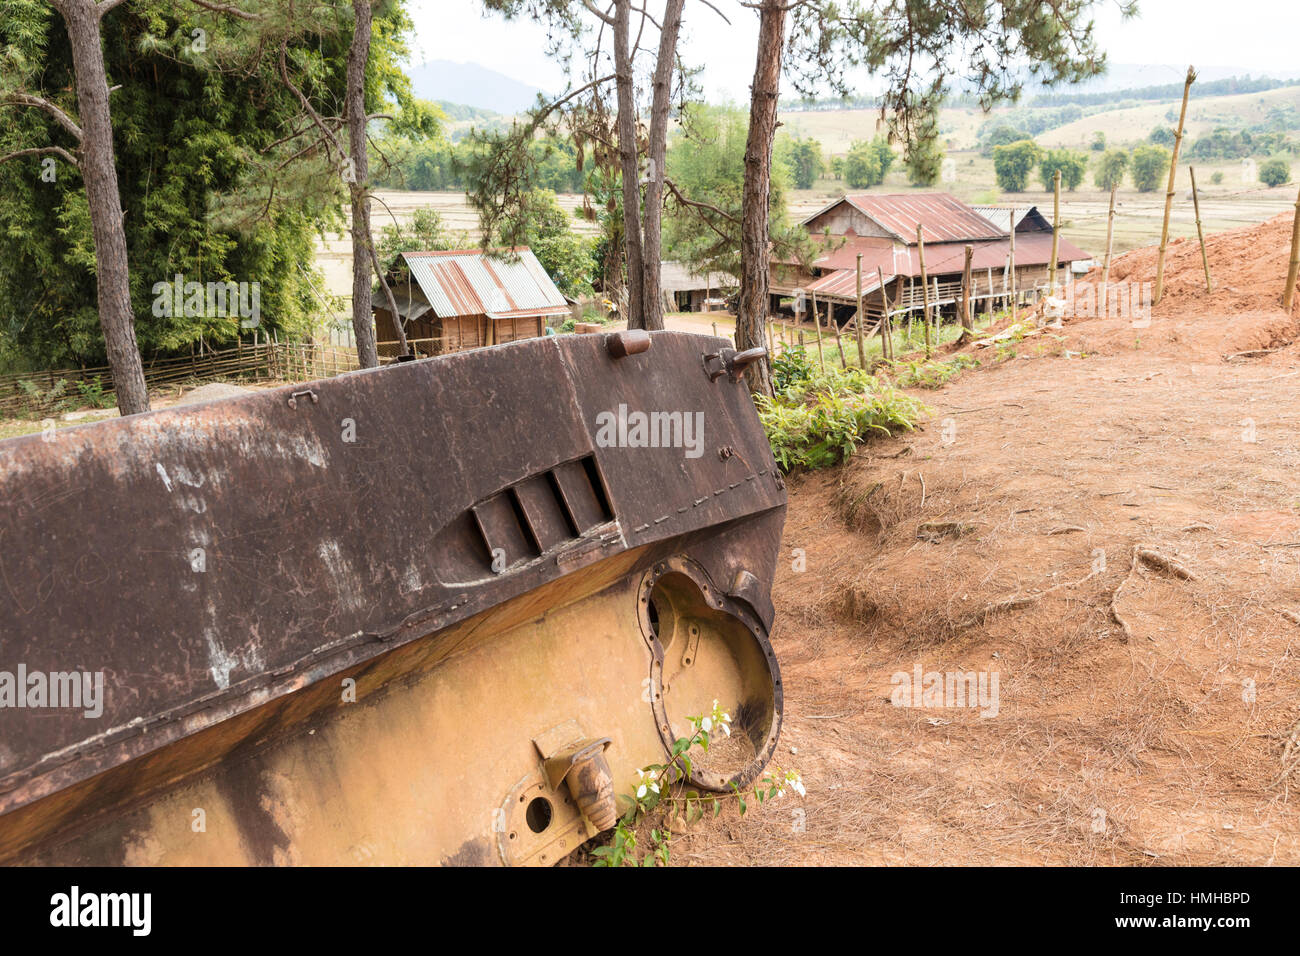 Guscio del serbatoio russo nei pressi di Ban Nakho village, Xieng Khuang Provincia, Laos Foto Stock